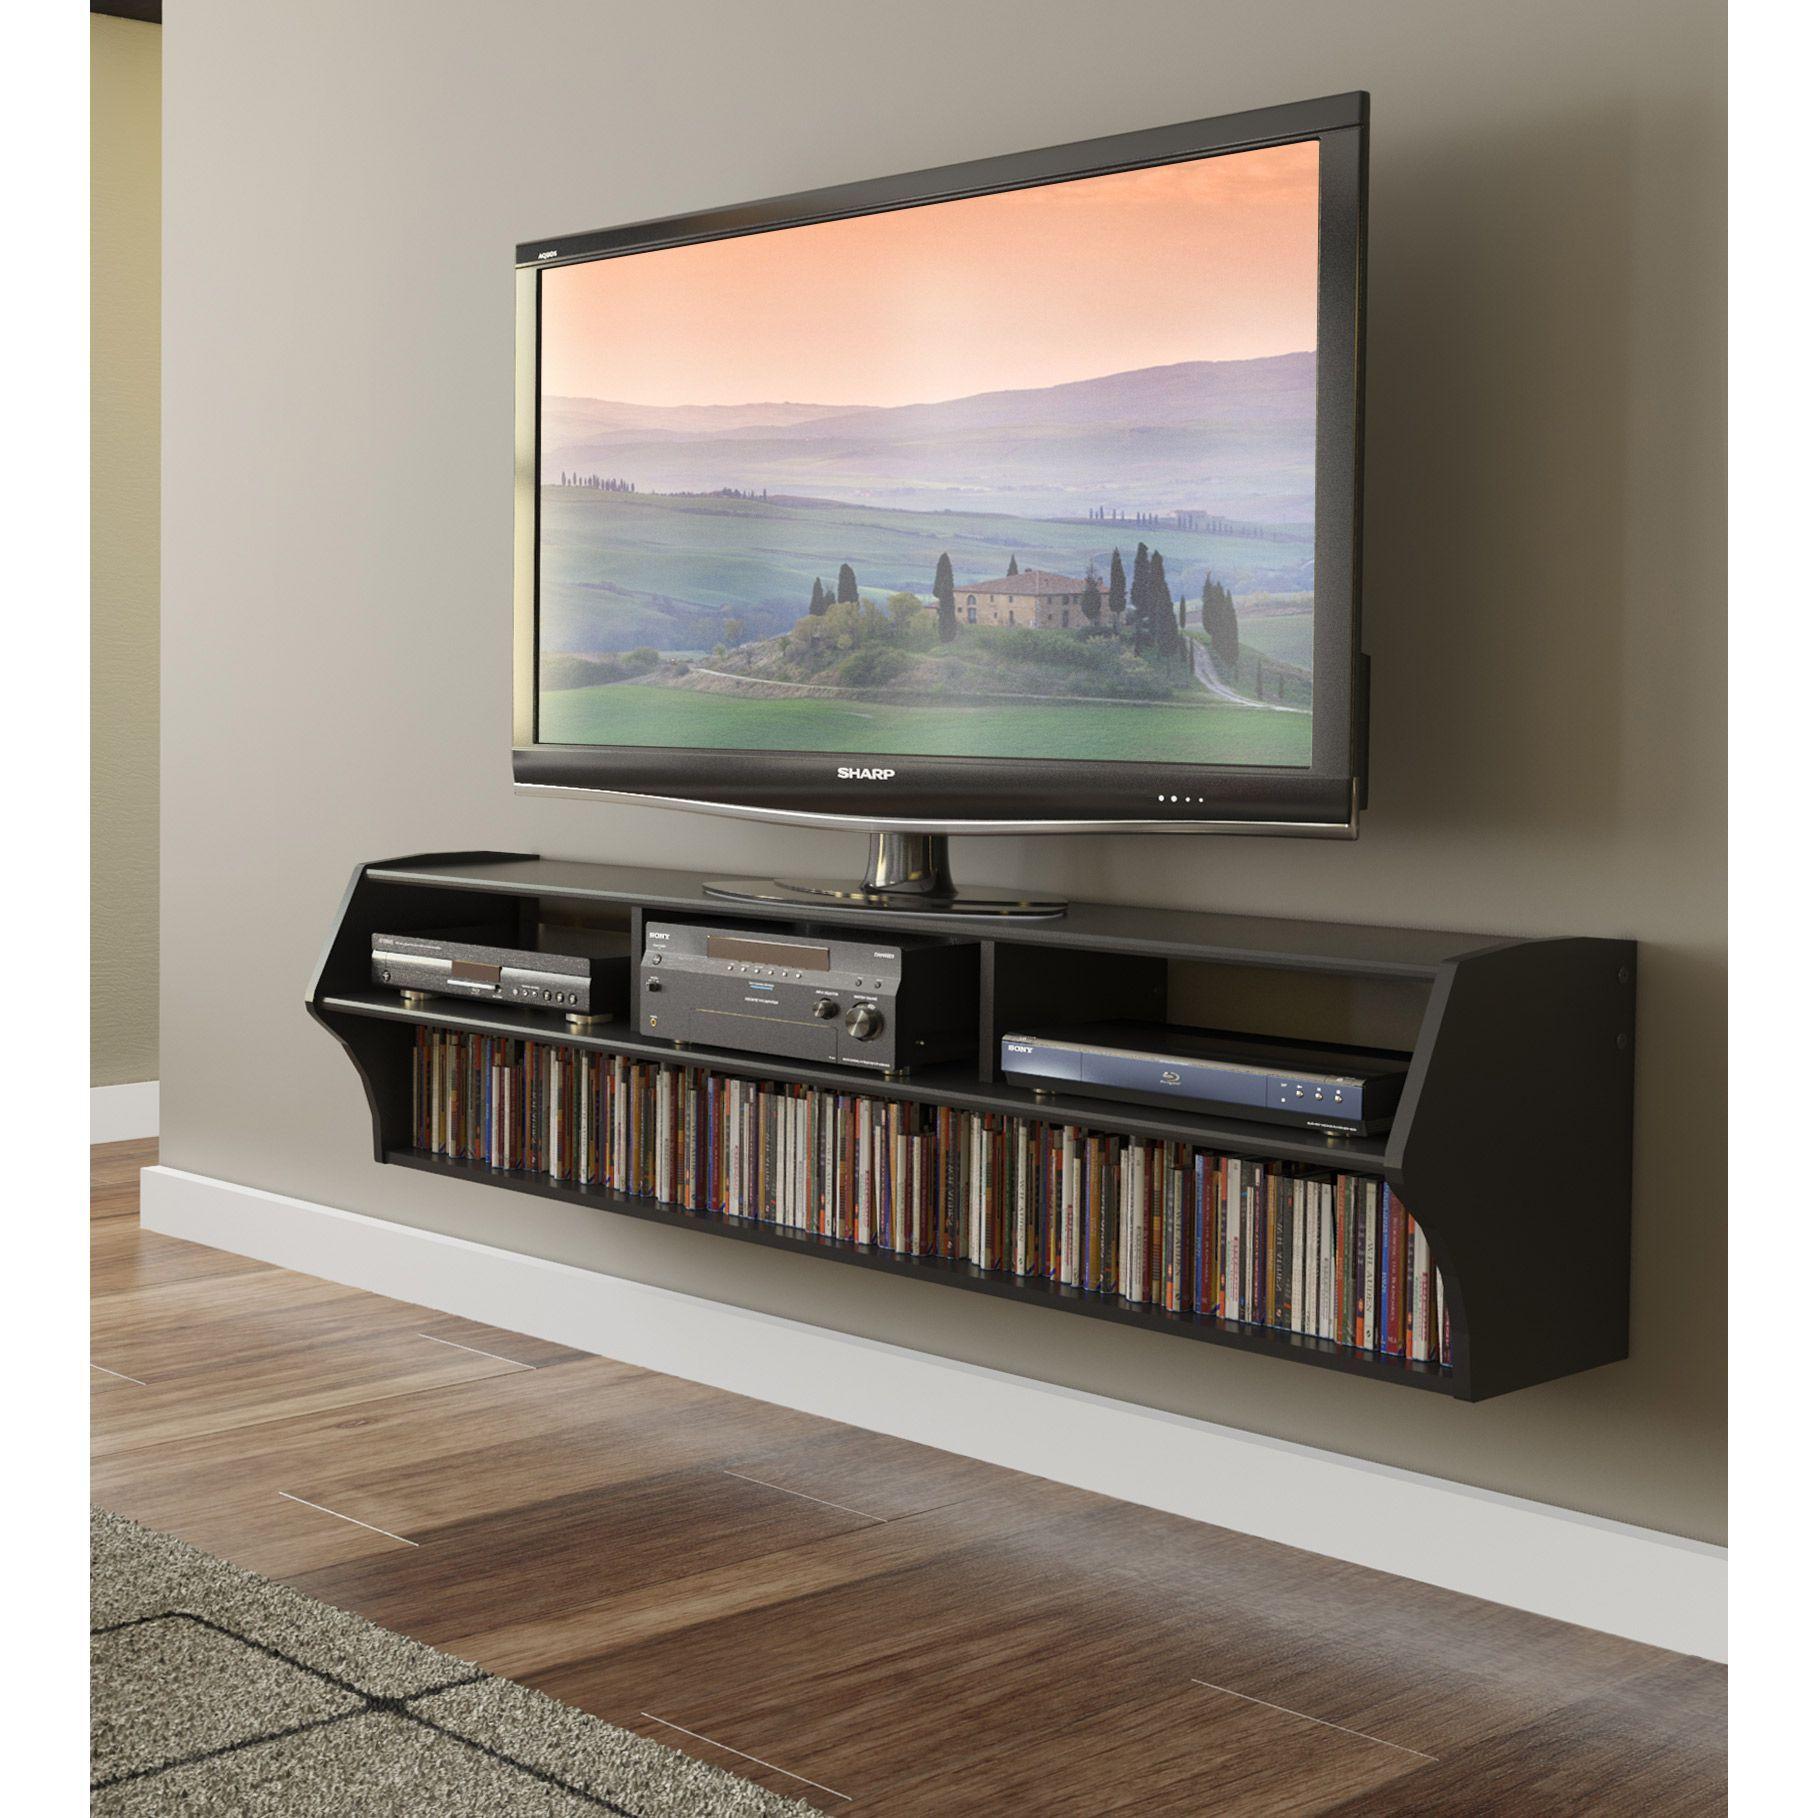 Подставка под телевизор на стену своими руками